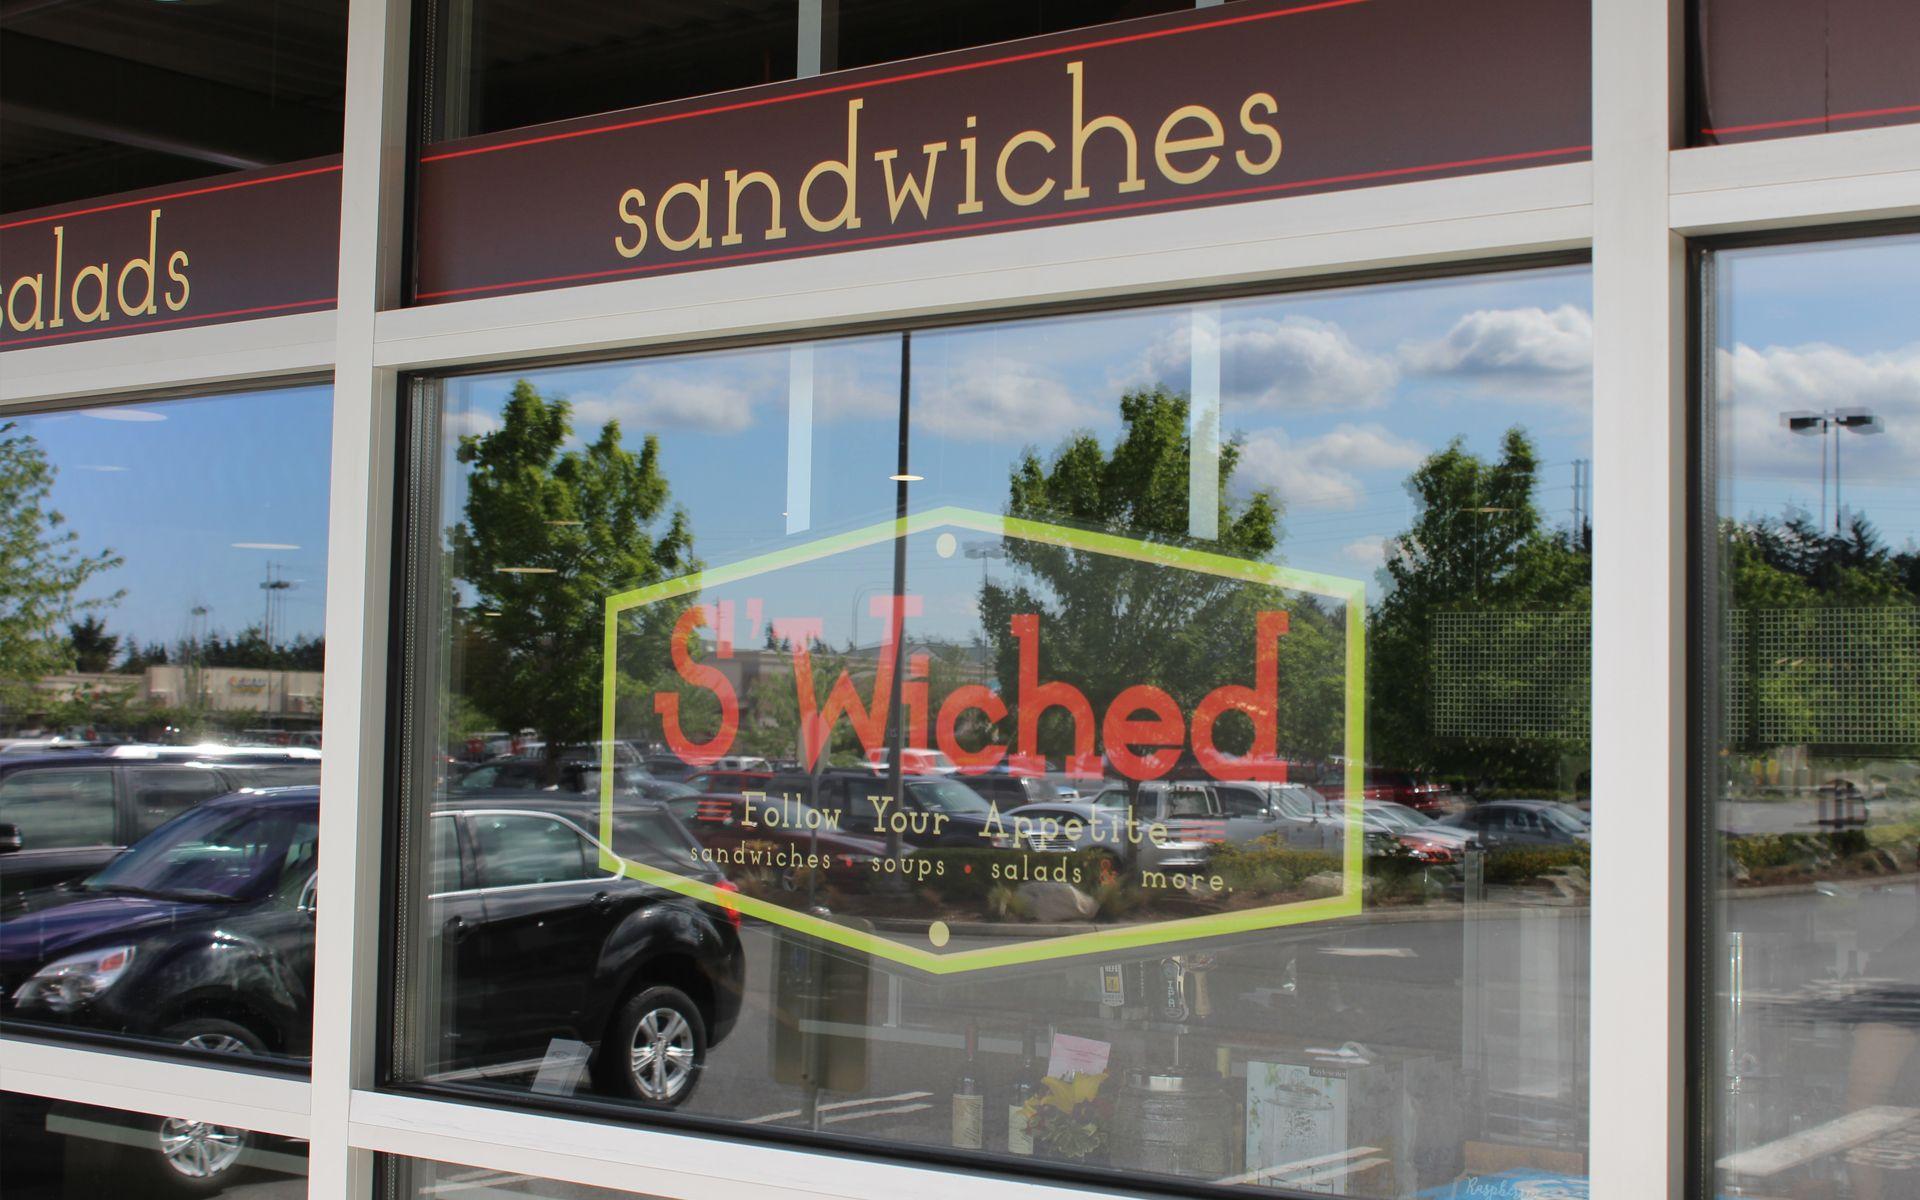 swiched-02.jpg